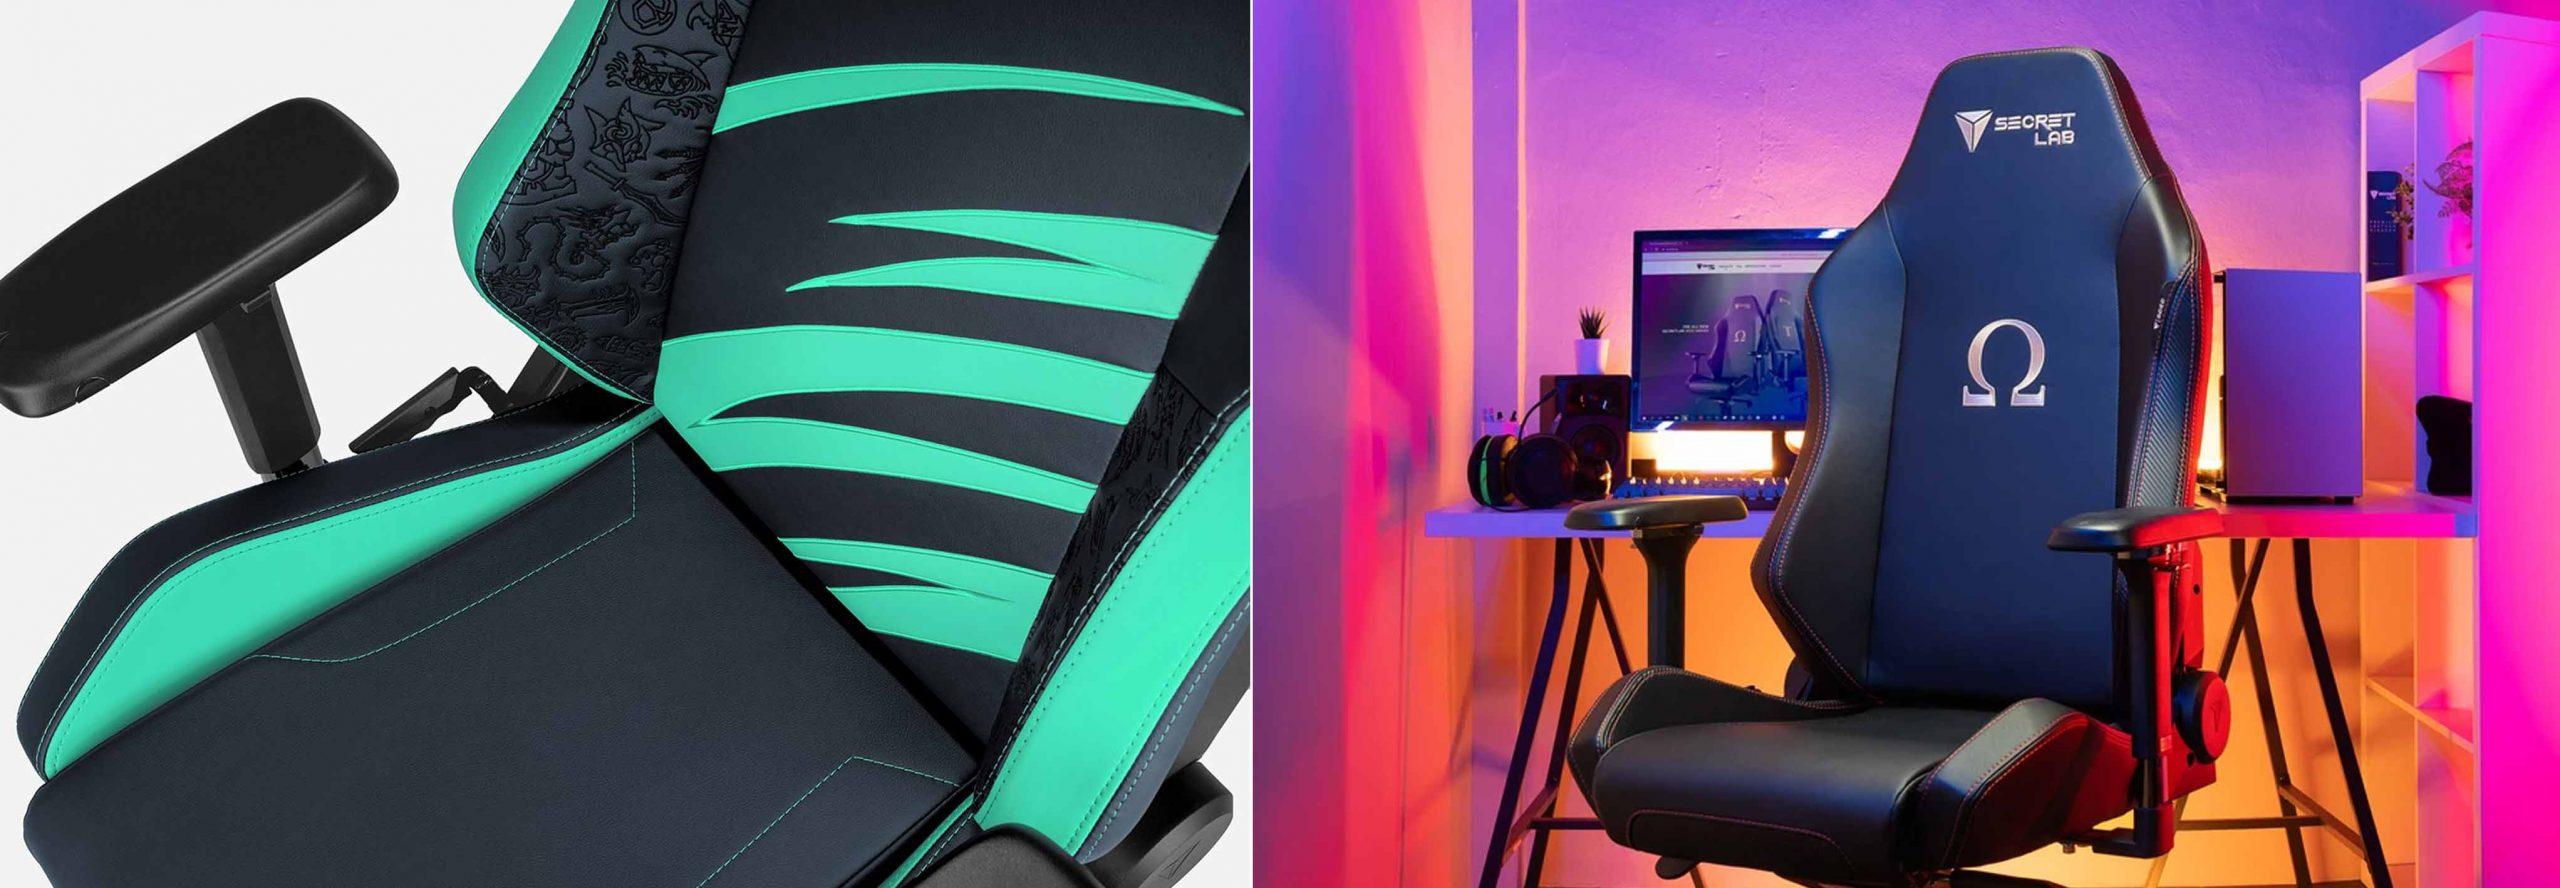 gaming chairs  - SecretLab-Omega-2020 - صندلی های بازی --معرفی-و-کاربرد-صندلی-گیمینگ---انواع-صندلی-بازی---صندلی-گیمینگ---تاریخچه-صندلی-گیمینگ- gaming-chair